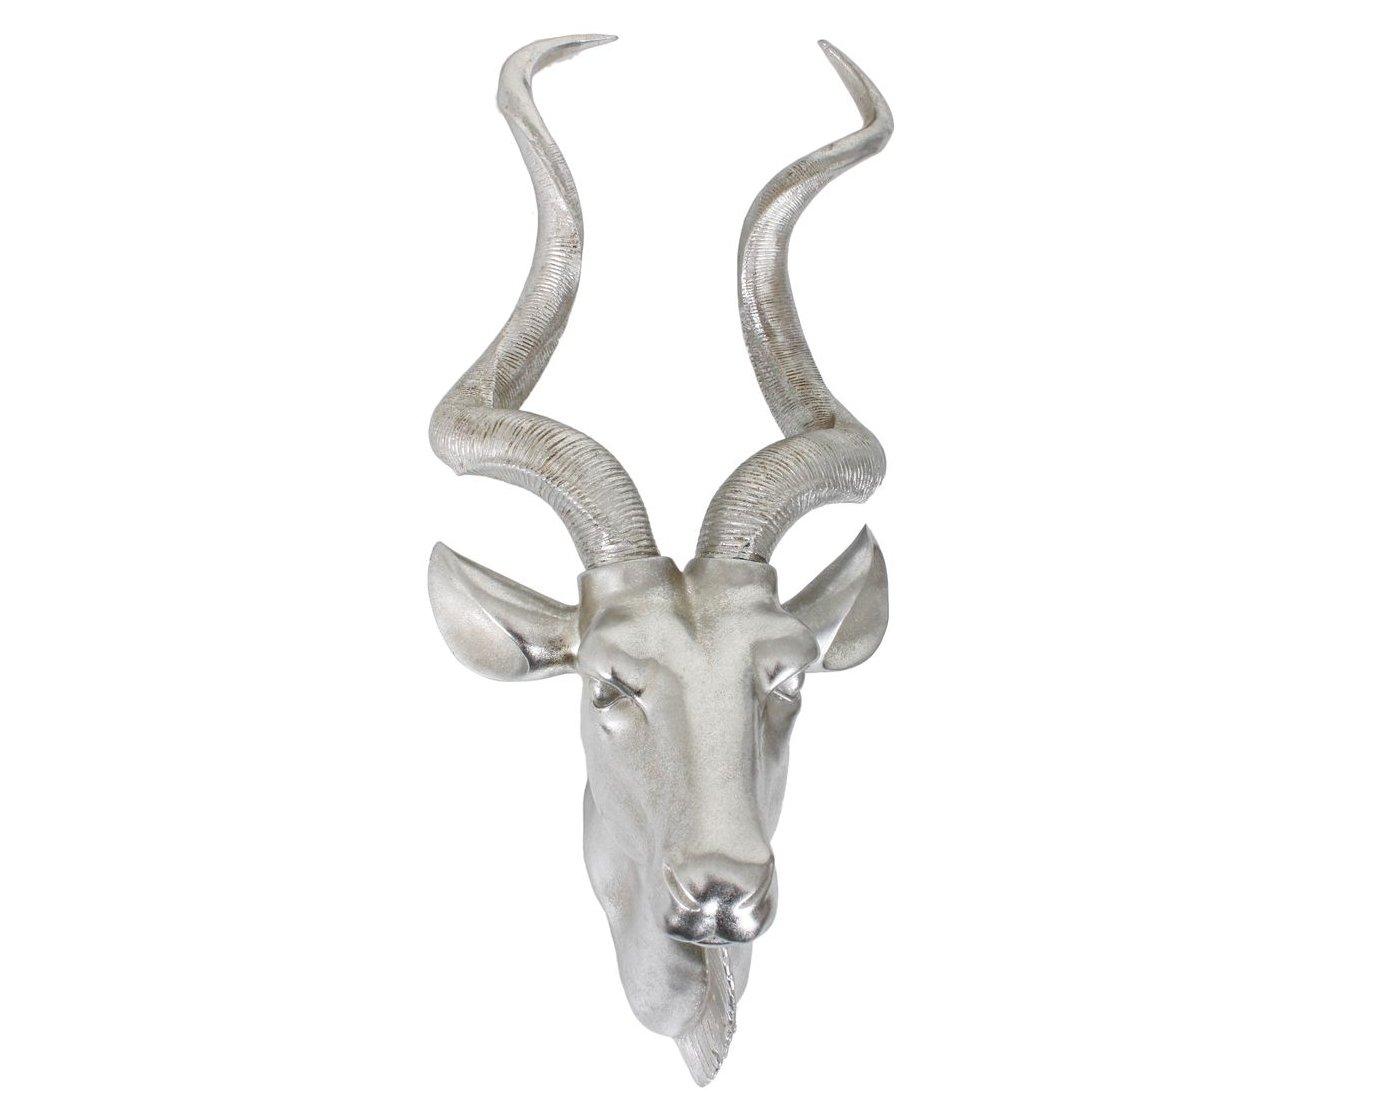 Jardinion Deko Geweih, Antilope, Edel Design Wanddeko Eyecatcher, Polyresin silberfarbend glänzend, Echtgröße, Tier Kopf Jagd